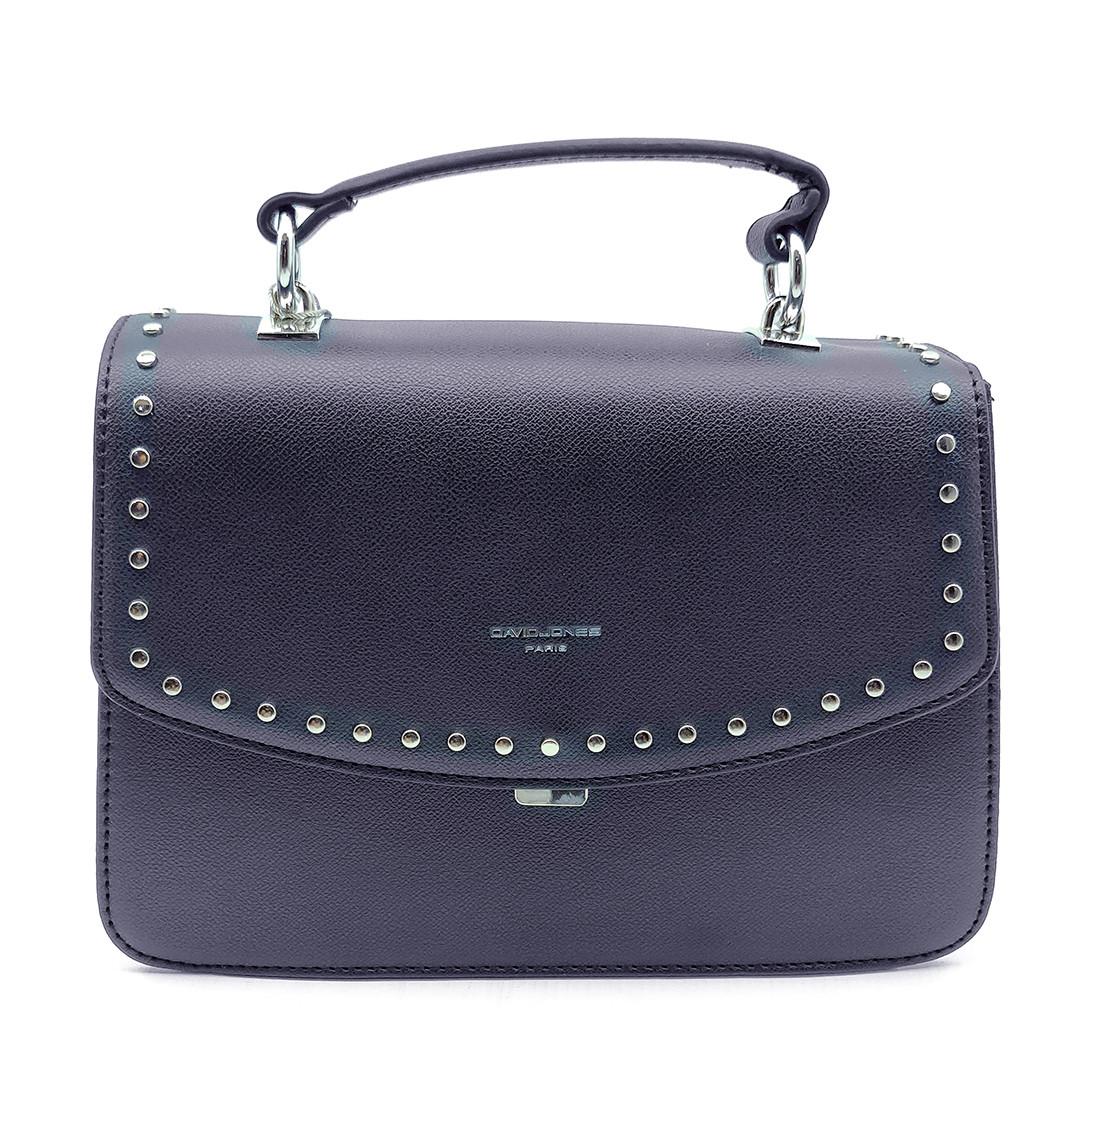 Женска сумка David Jones 17,5 x 26 x 11 см Синяя (djcm5486t/2)